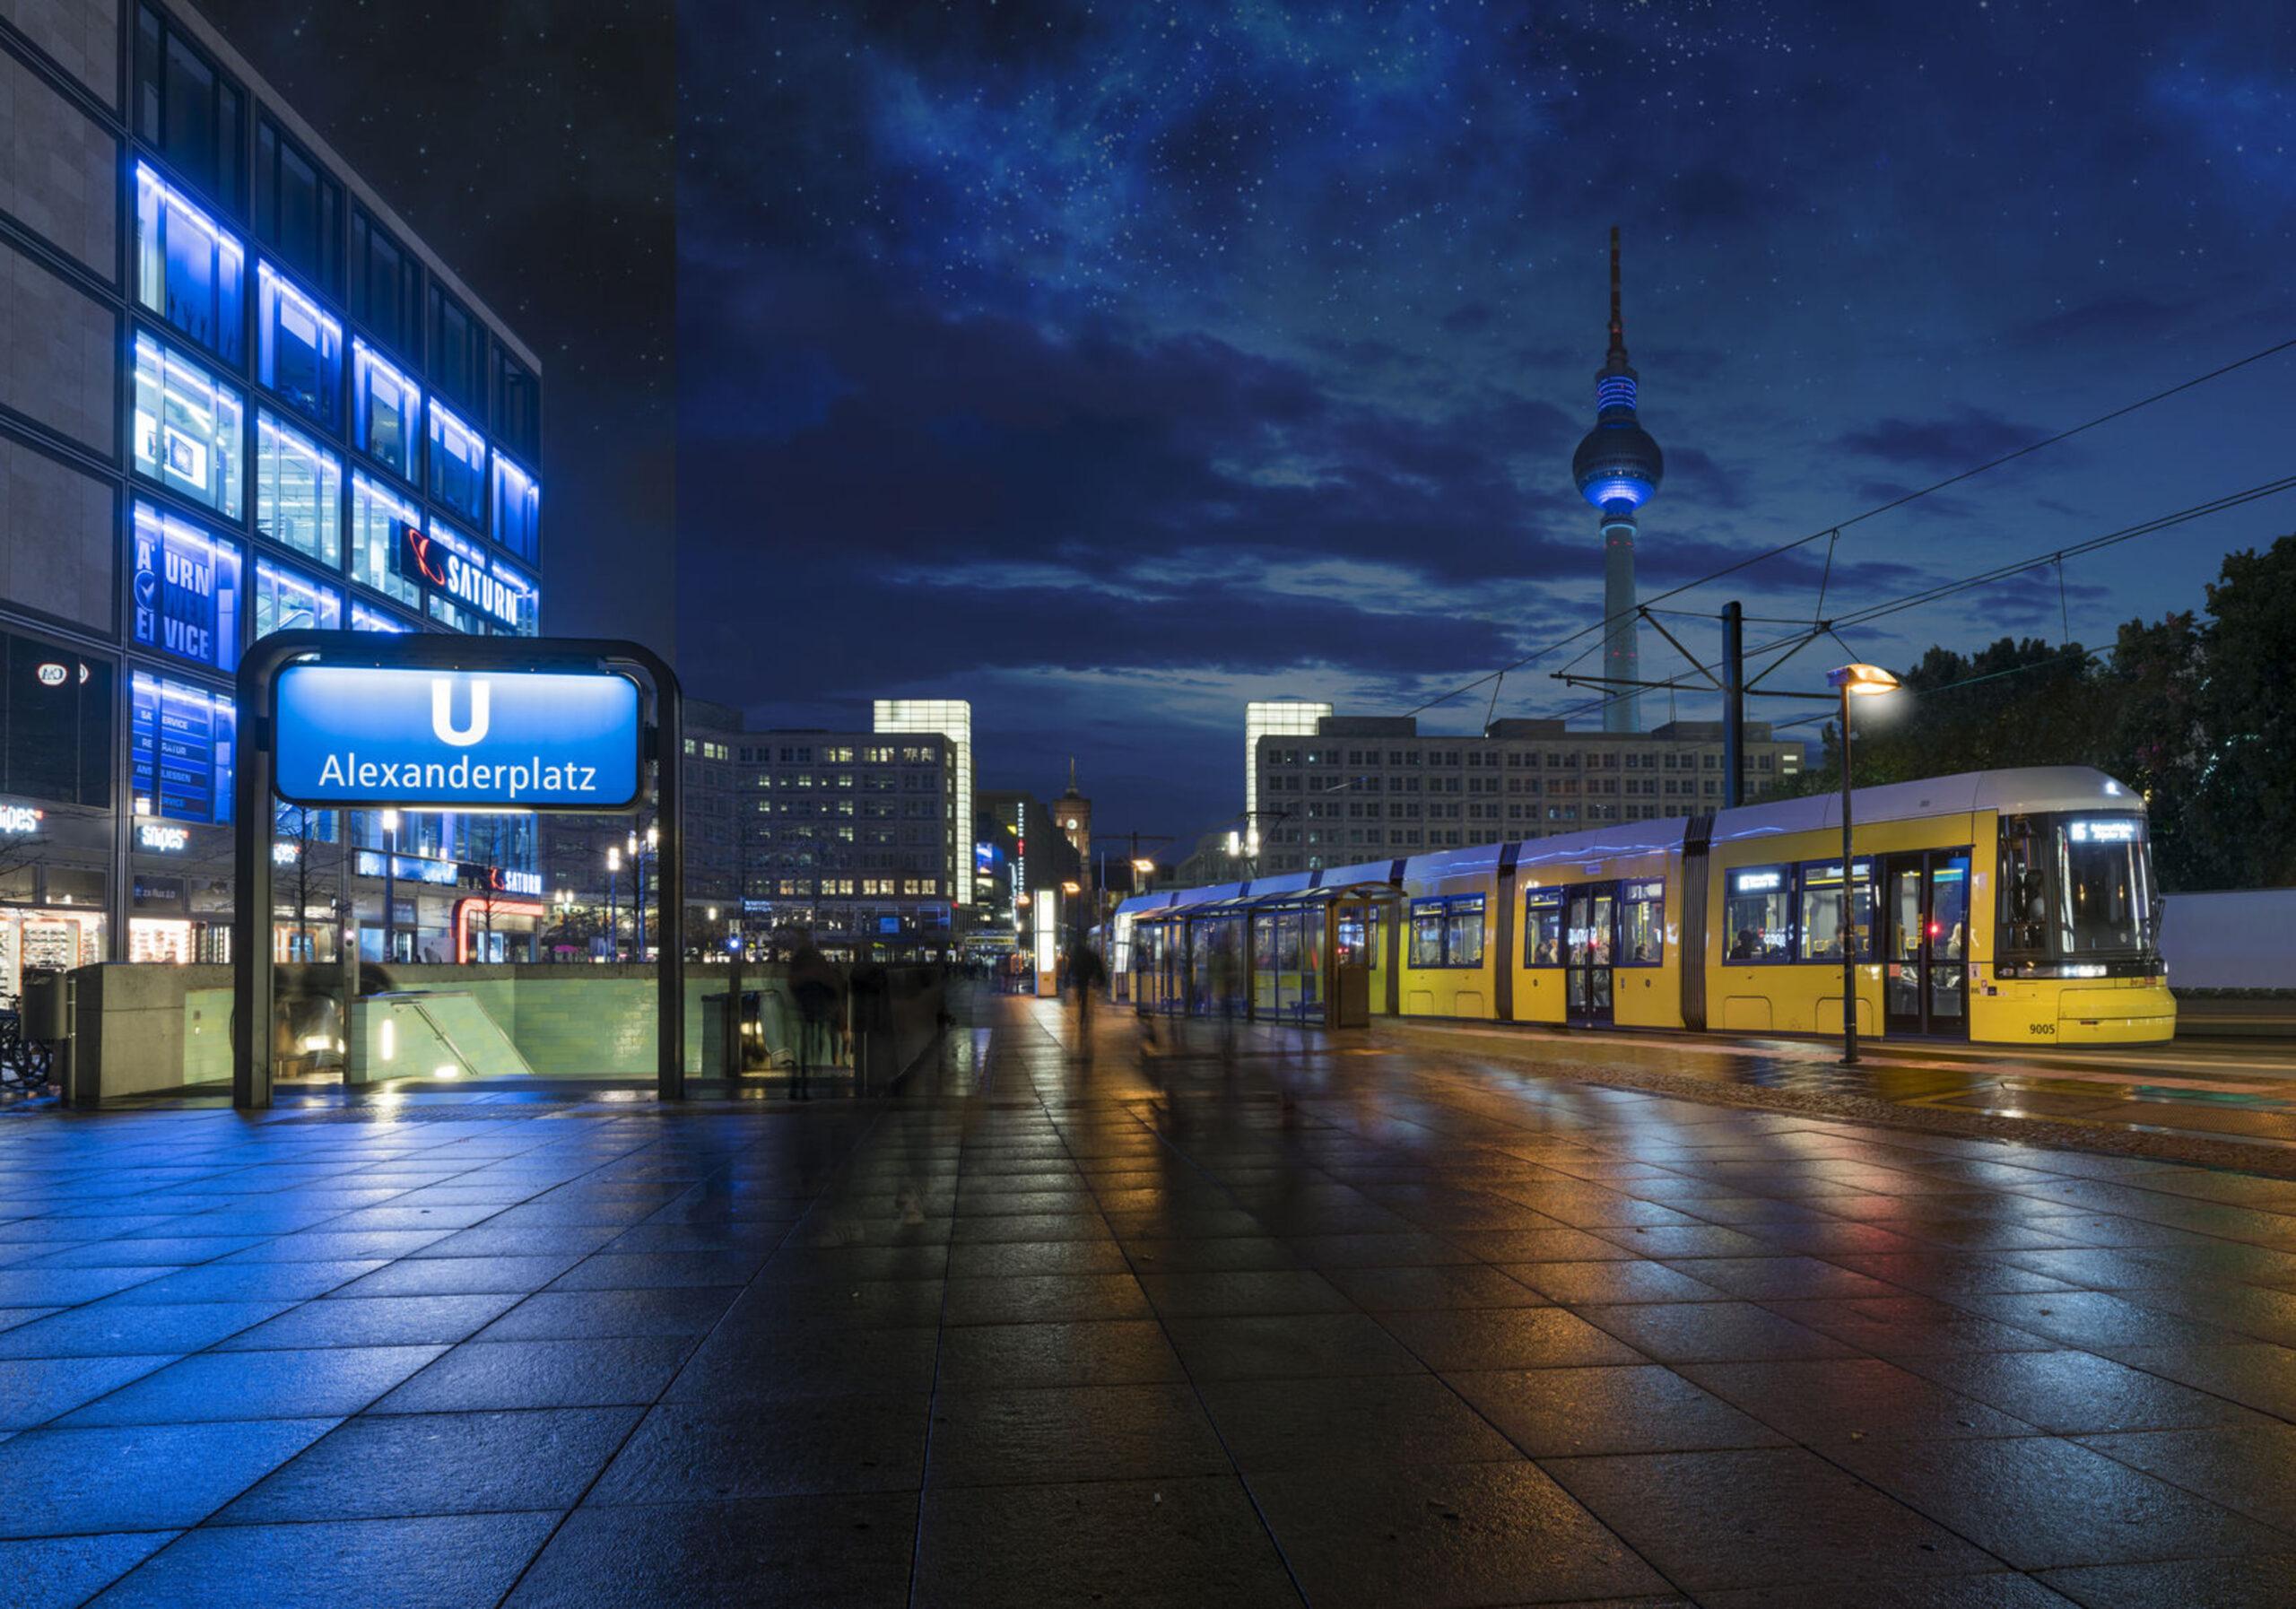 Bombardier Flexity tram, Berlin at night